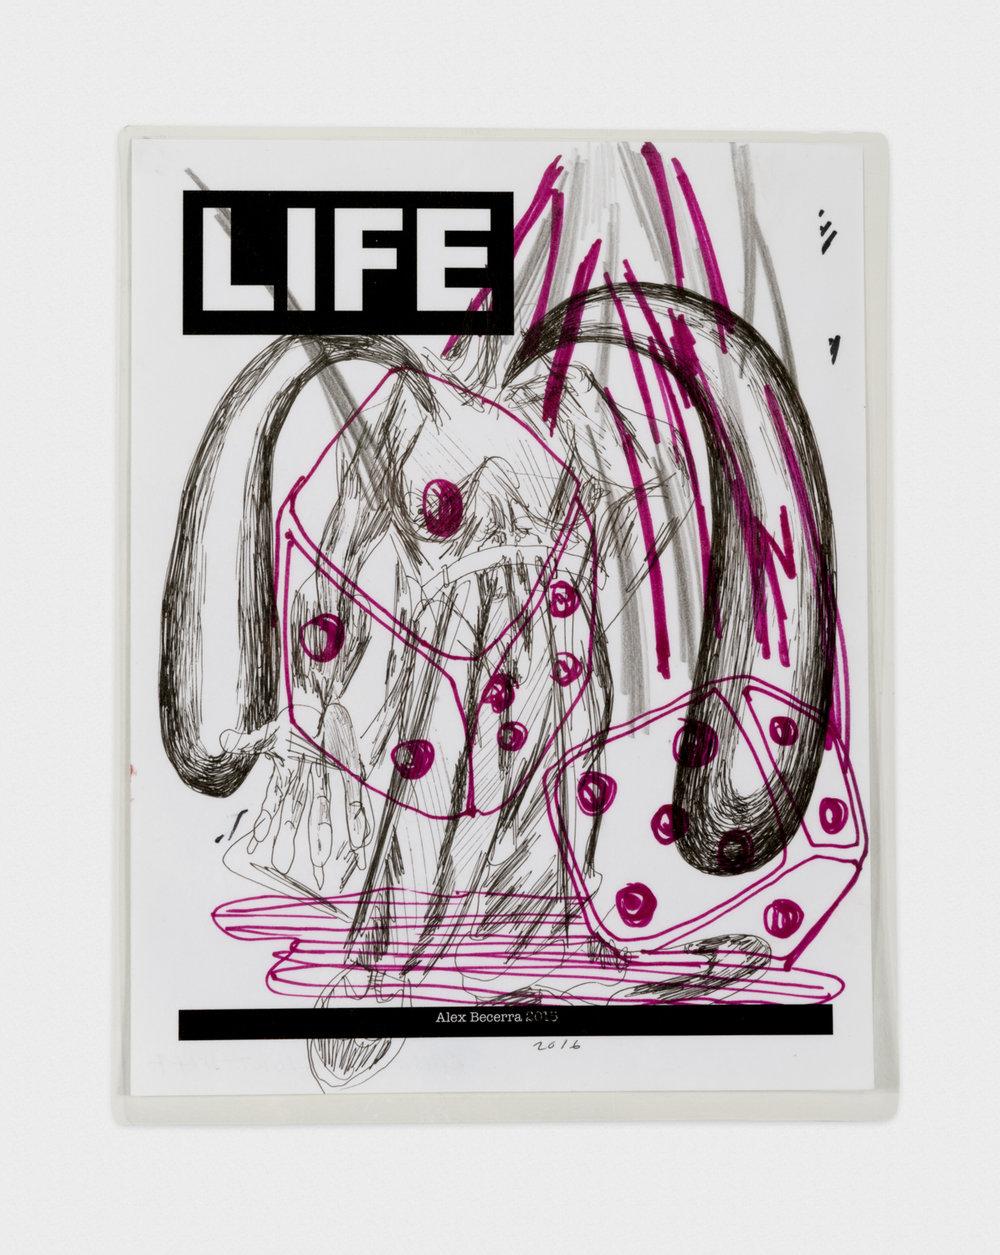 Alex Becerra La Movida Negra 2016 Pen and marker on photocopy (laminated) 11 x 8 1/2 in (27.94h x 21.59w cm) AB441